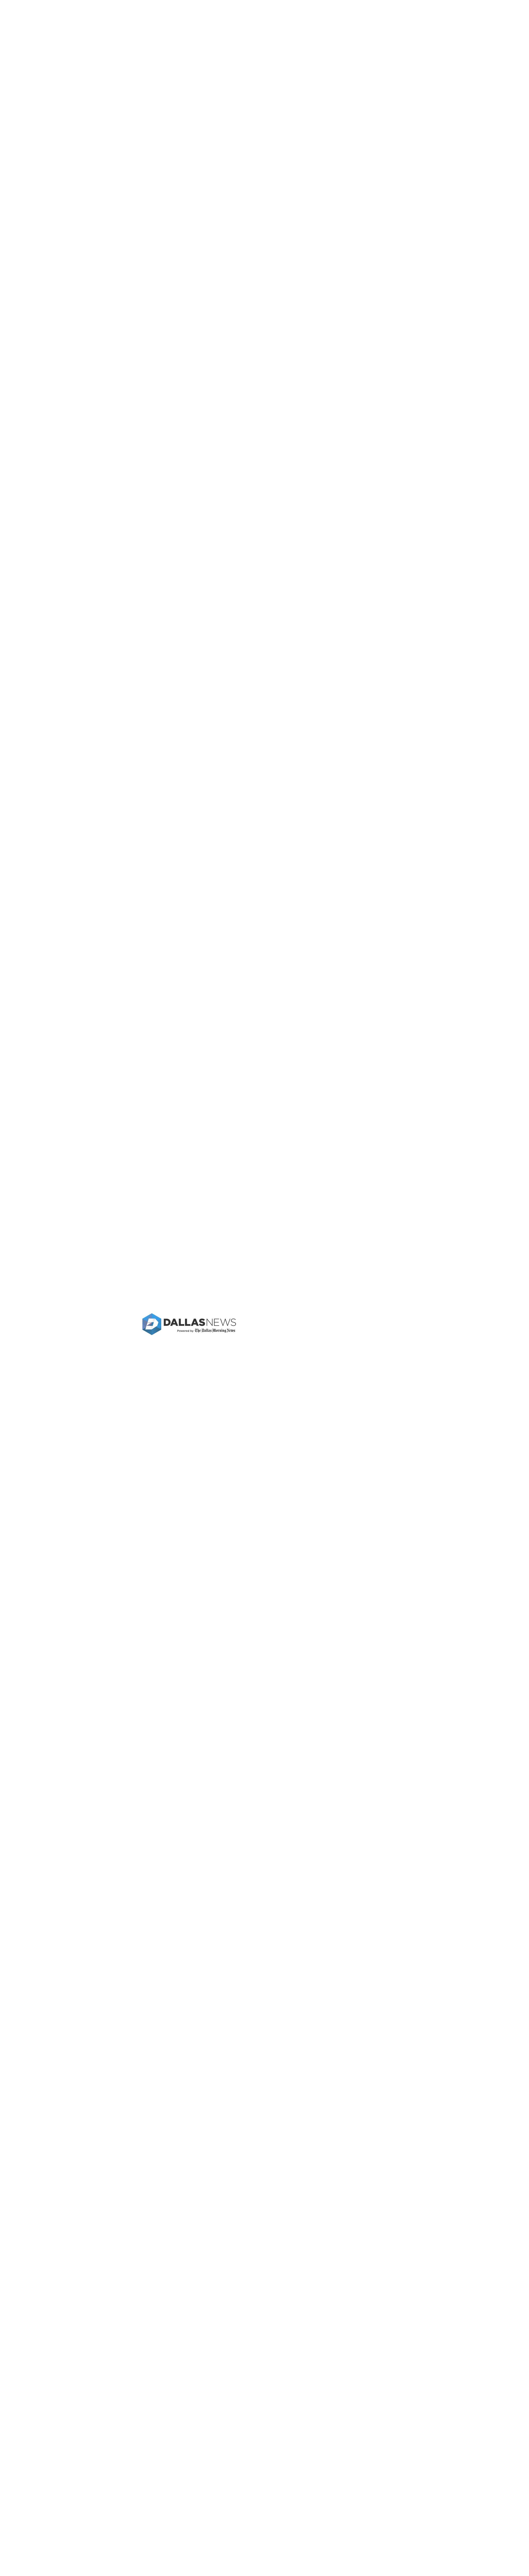 dallasnews.com at Friday March 23, 2018, 6:01 a.m. UTC